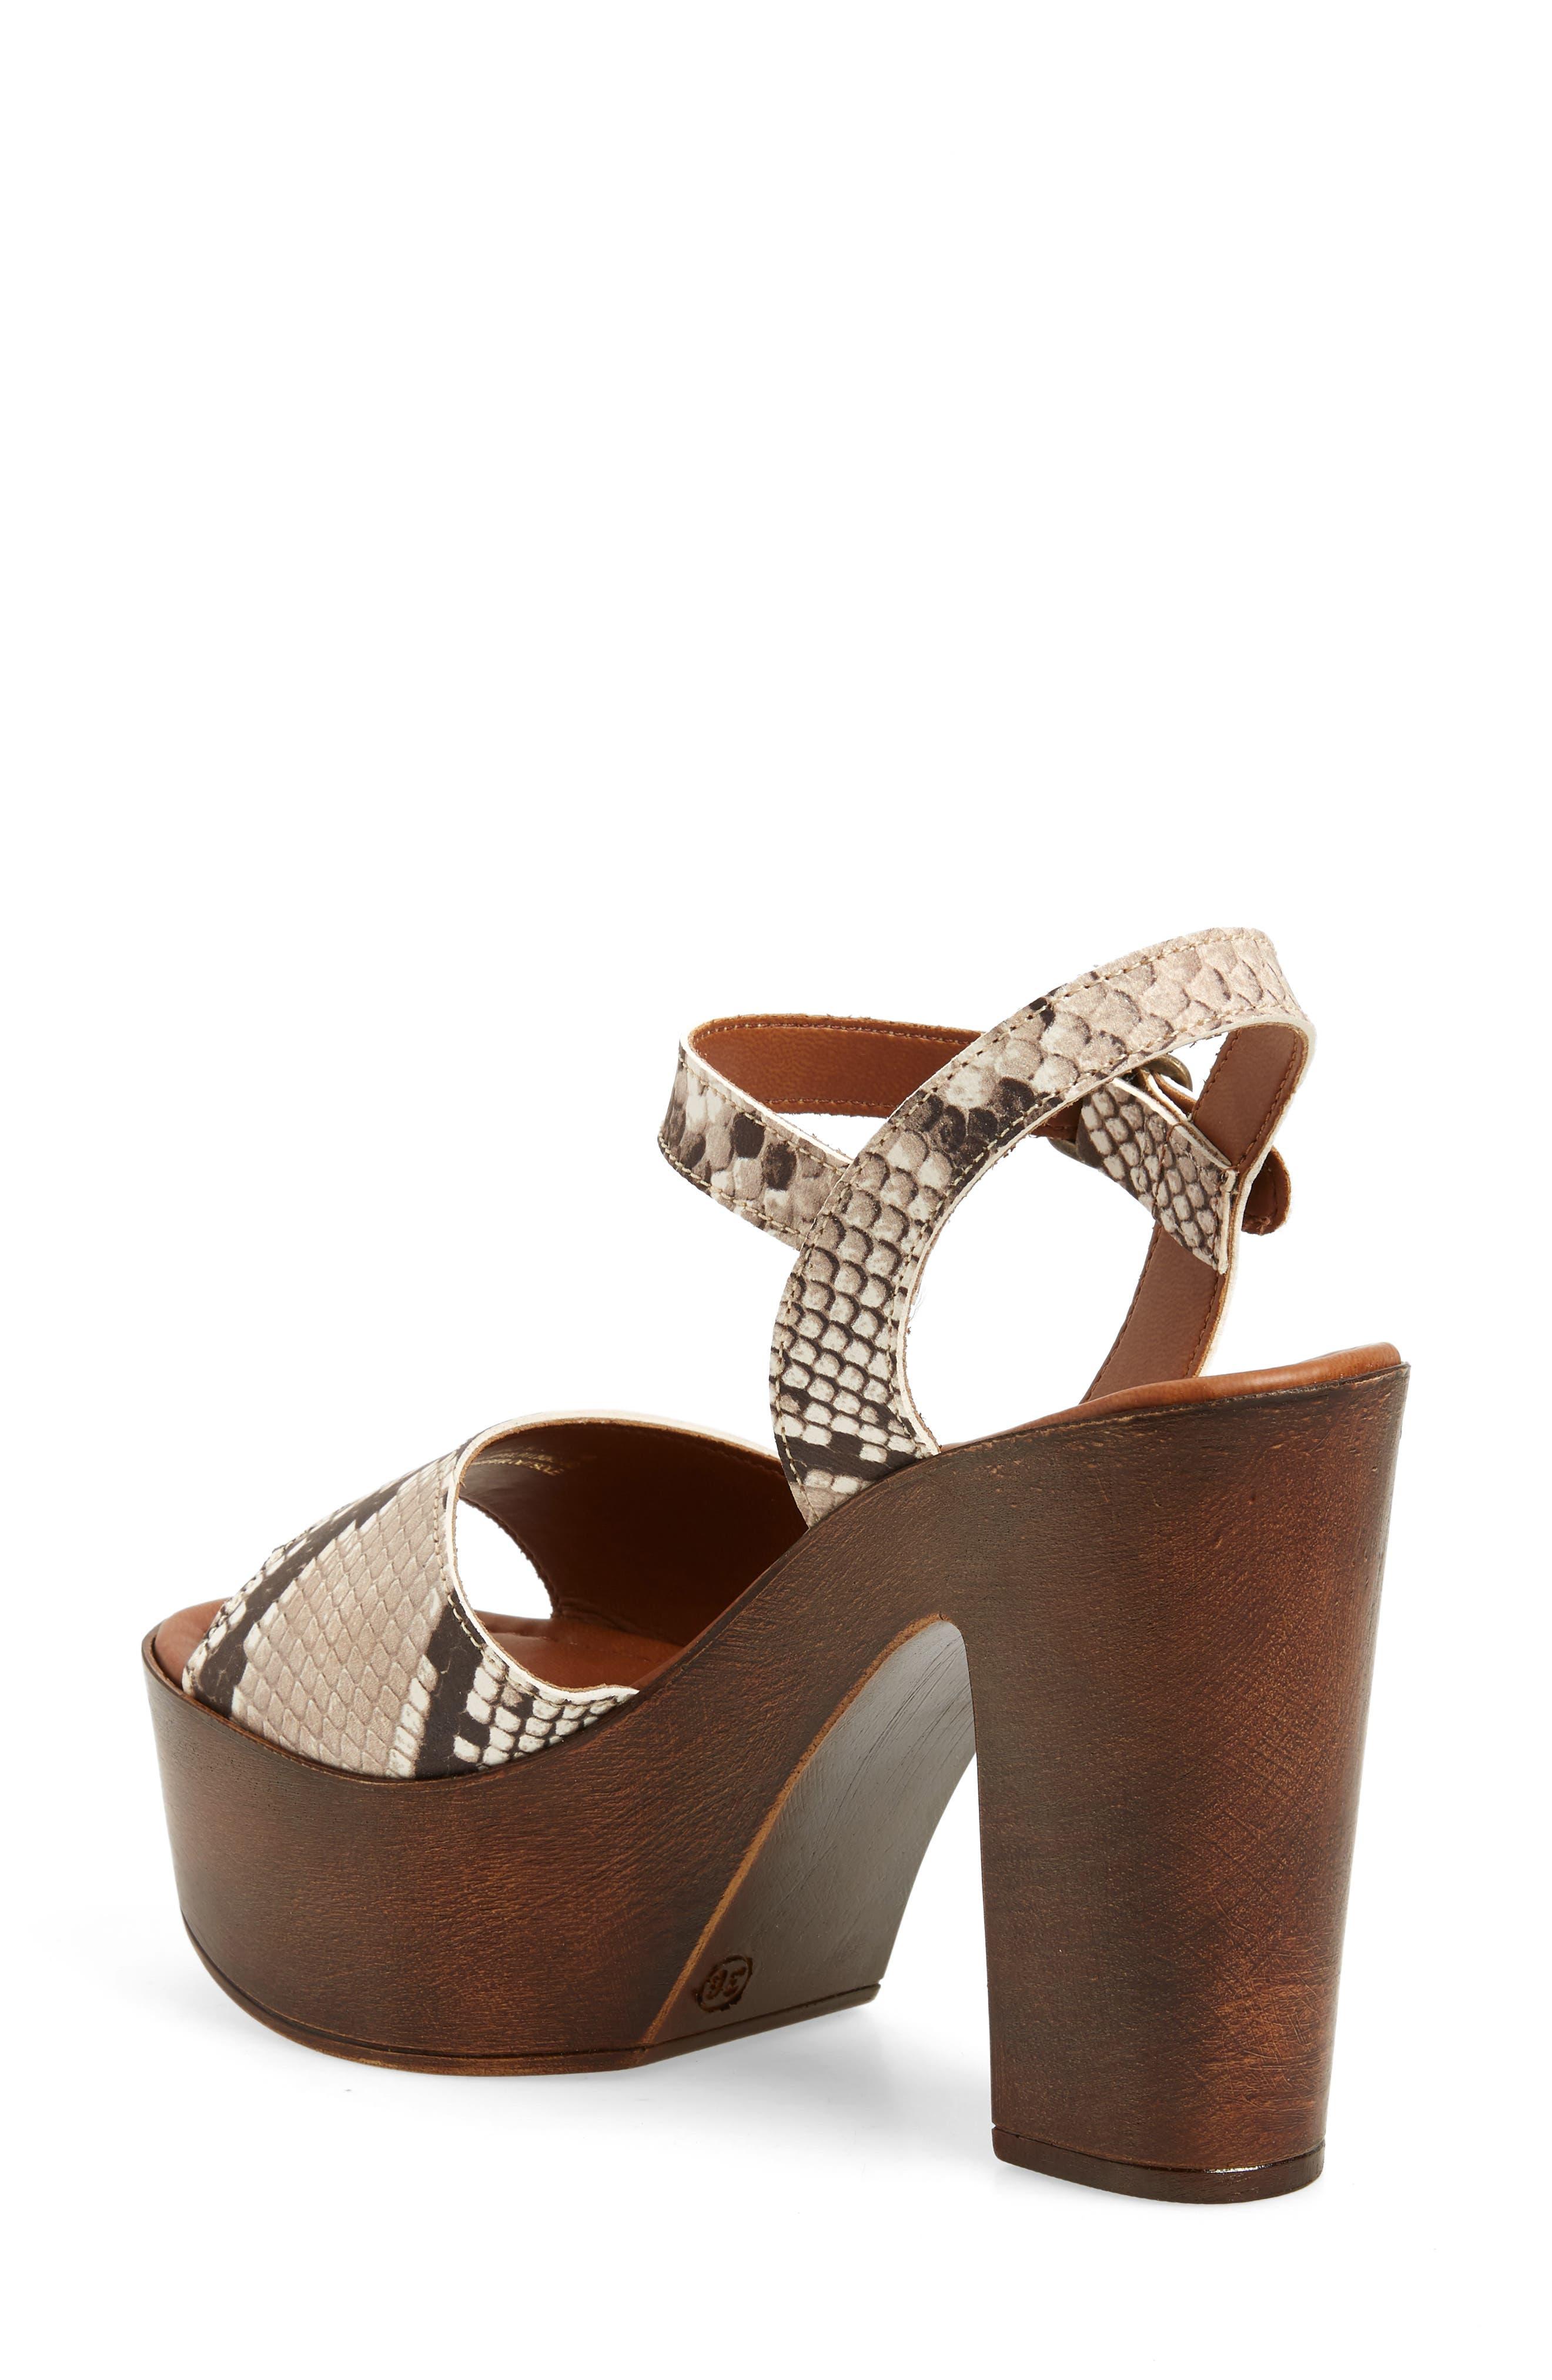 Lulla Platform Sandal,                             Alternate thumbnail 2, color,                             White Reptile